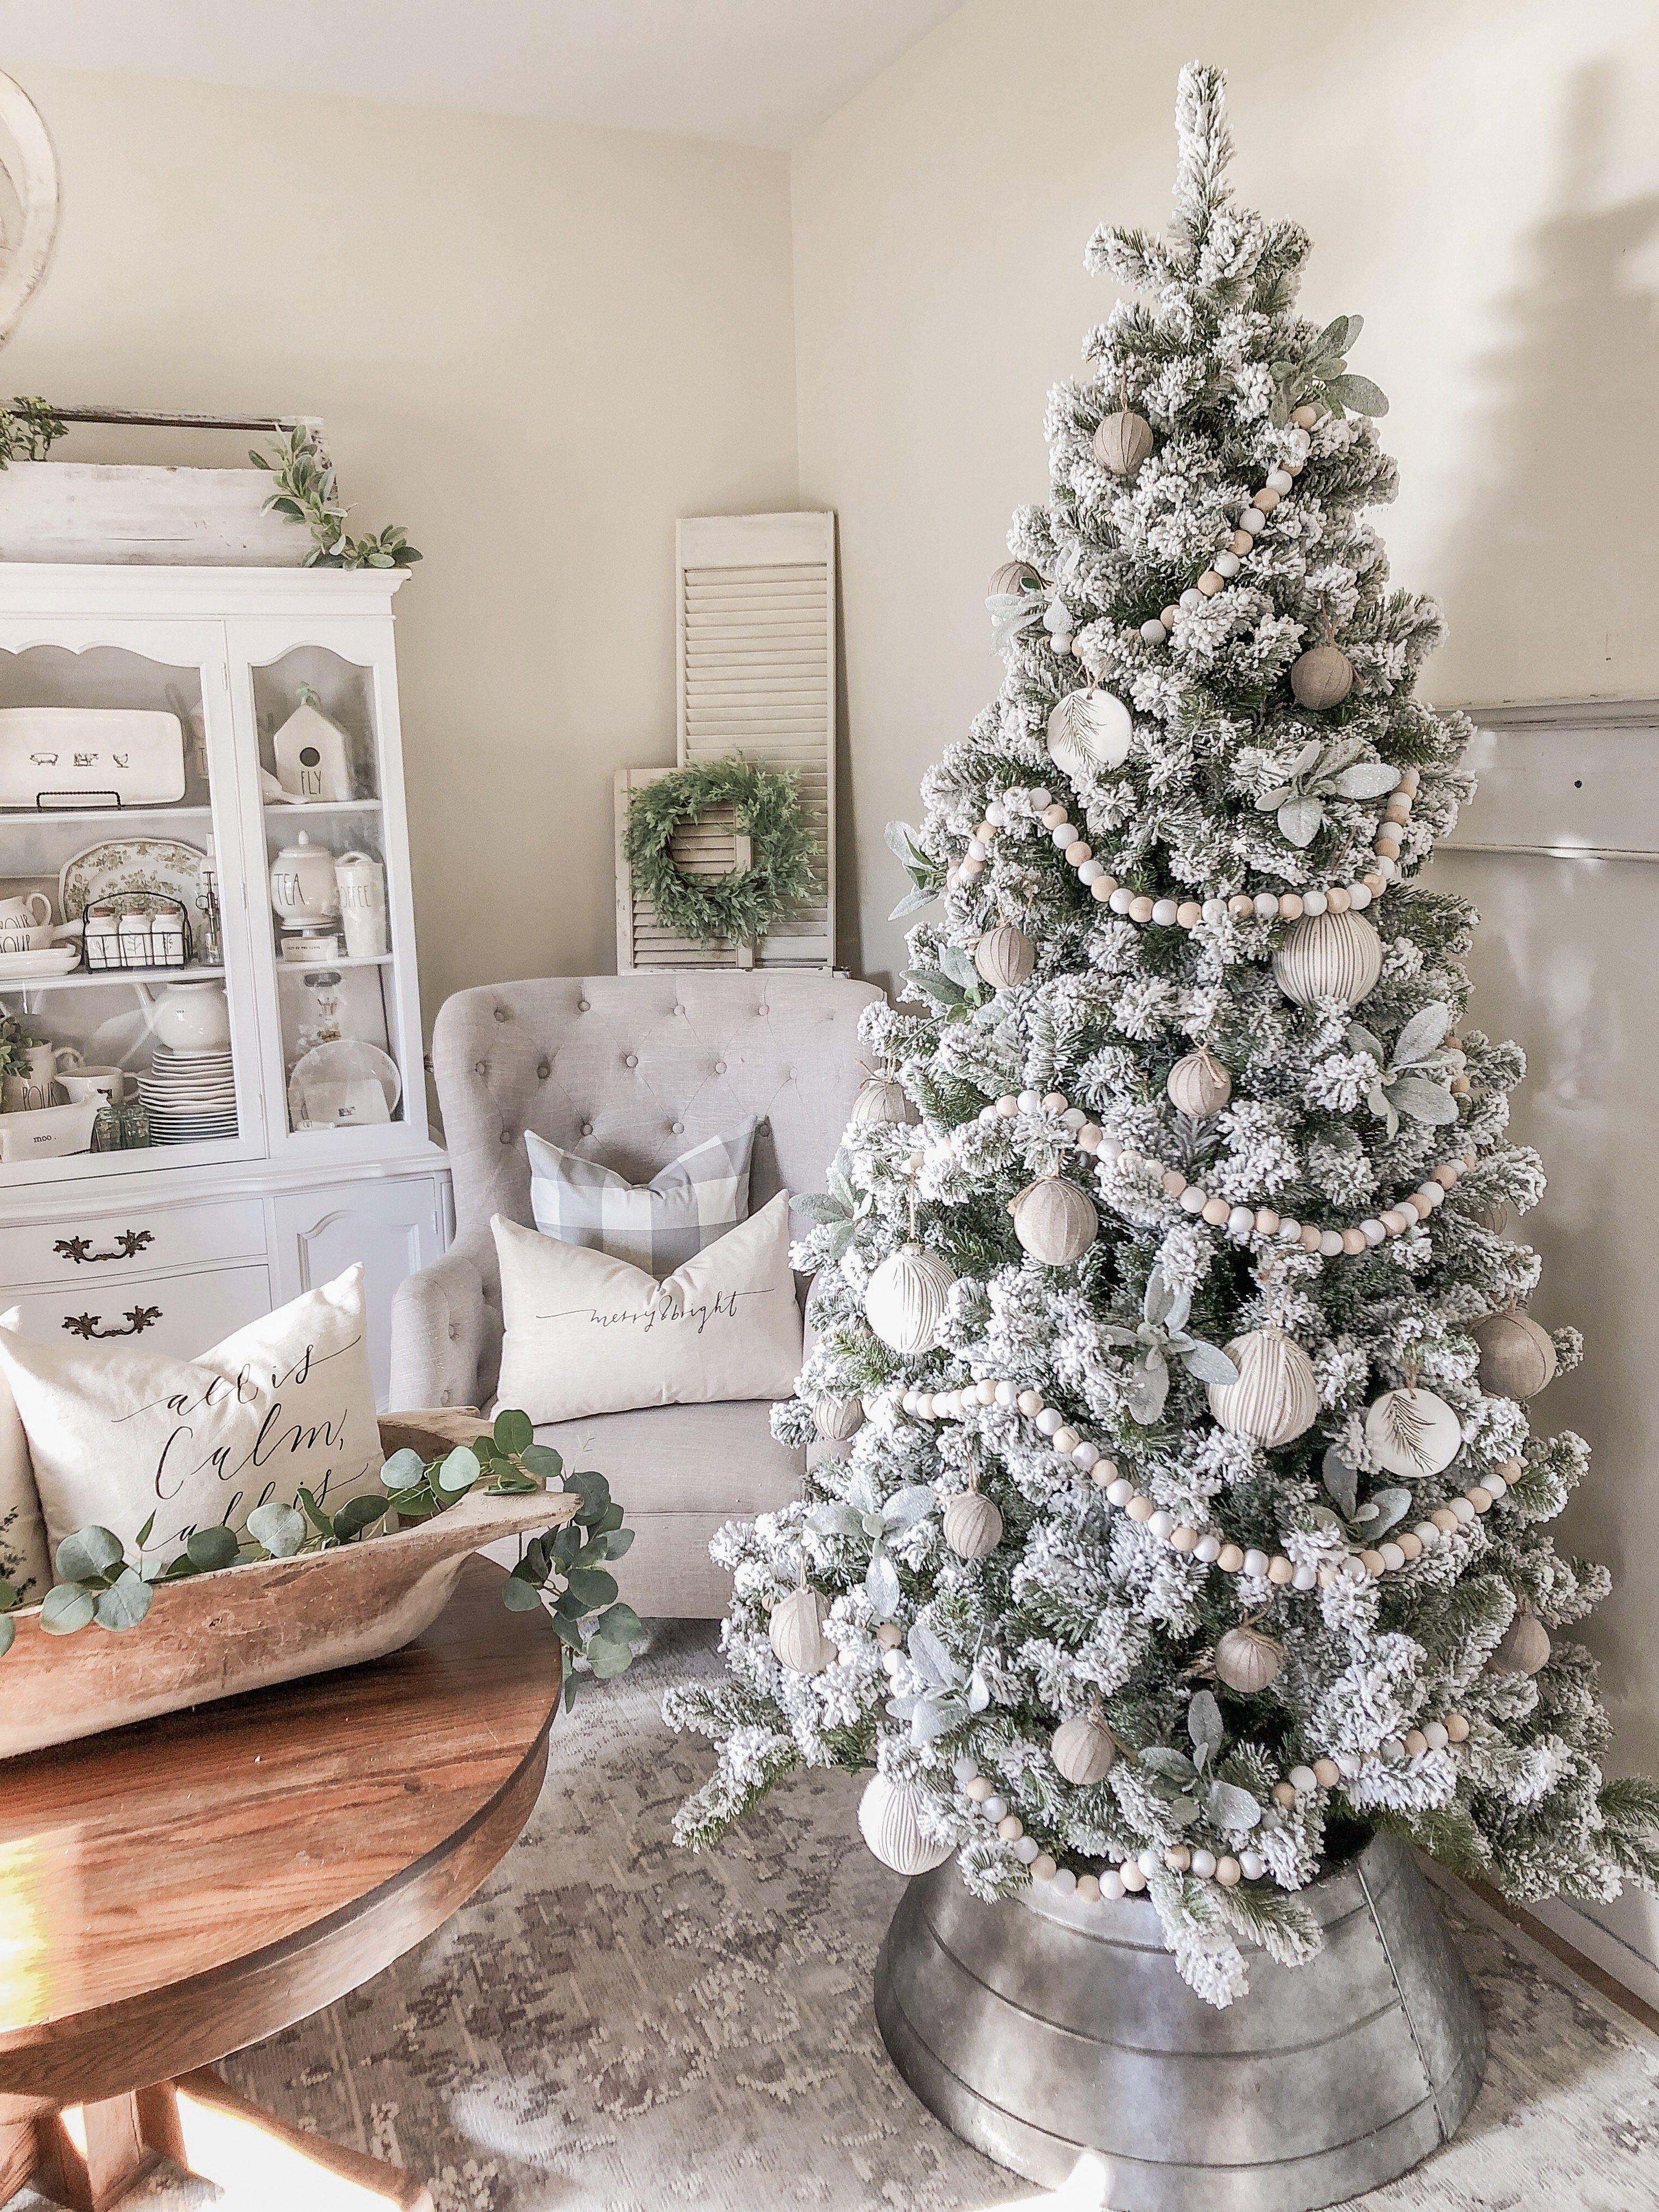 6' Prince Flock Artificial Christmas Tree Unlit - Default Title -   19 farmhouse christmas tree decorations diy ideas